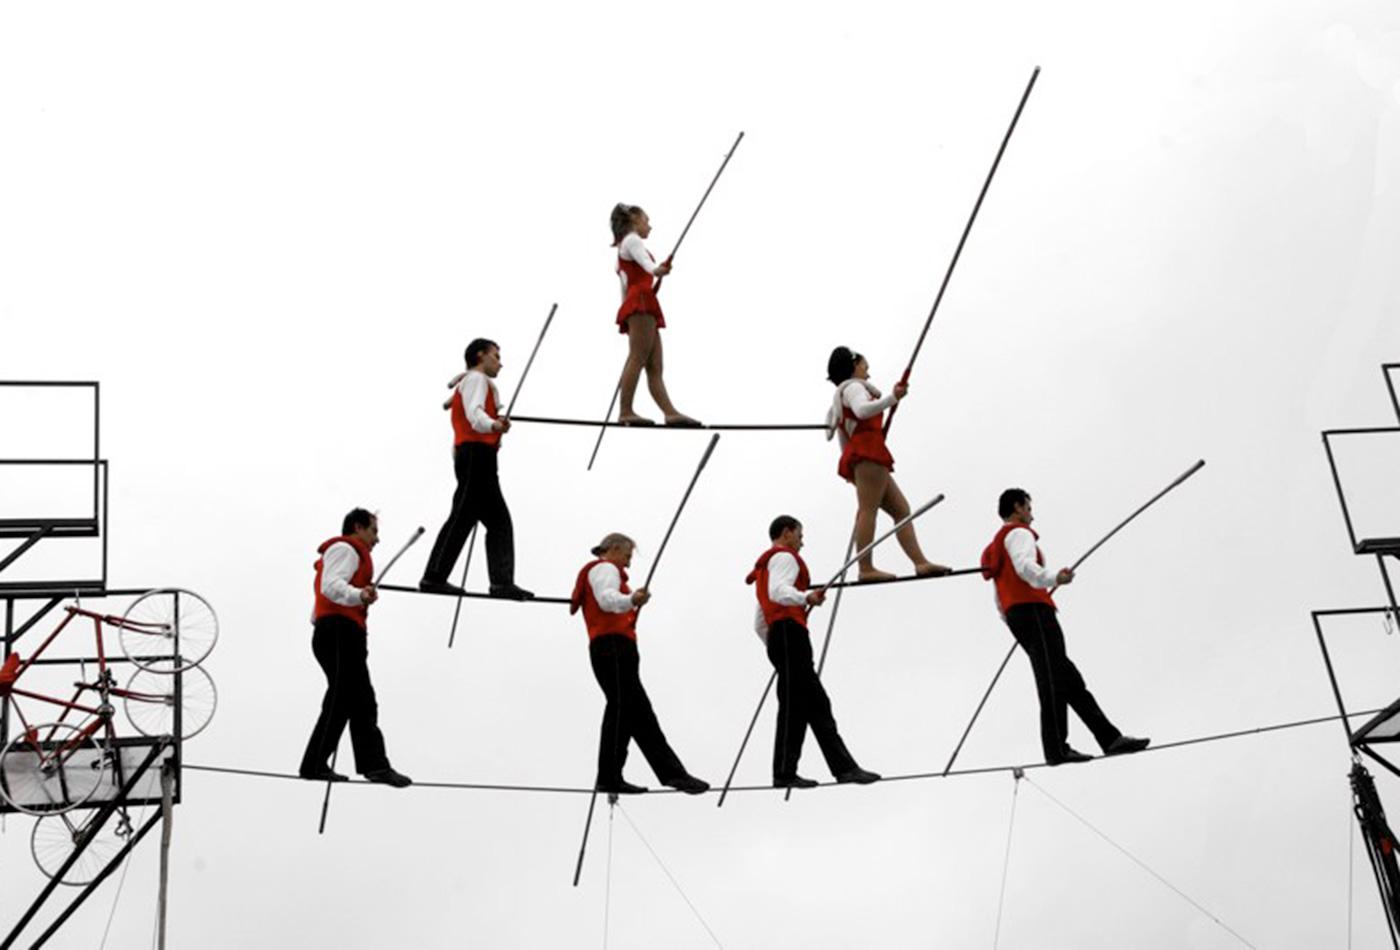 The Flying Wallendas 7-Man Pyramid The Big E Fair, 2005.